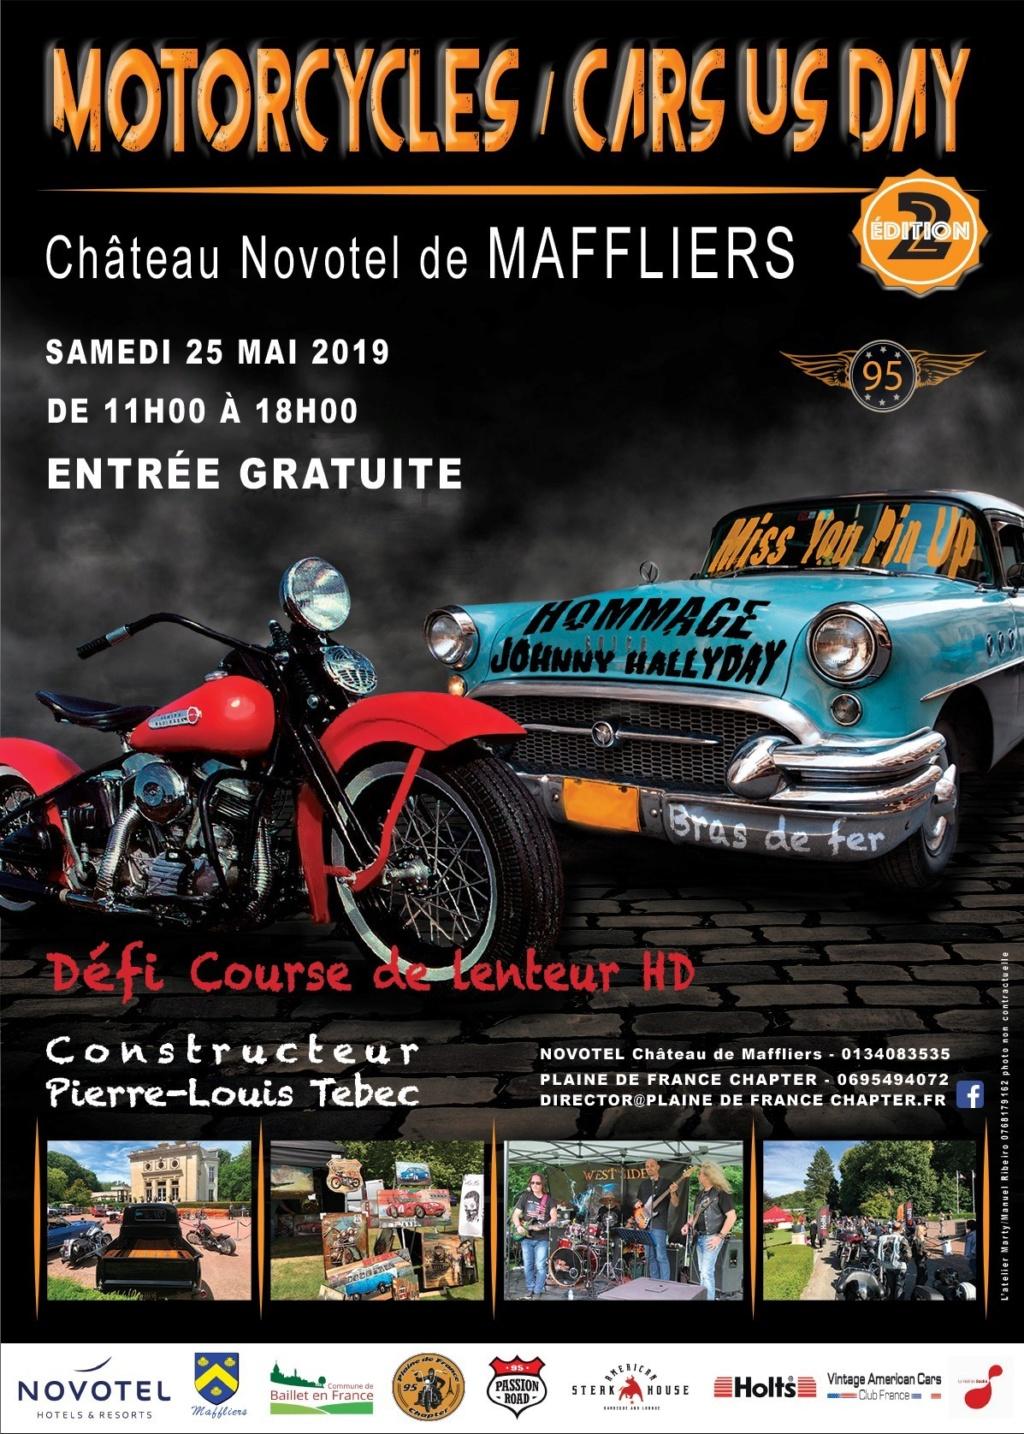 Motorcycles / Cars  US DAY - 25 Mai 2019 - Chateau Novotel de MAFFLIERS Affich36